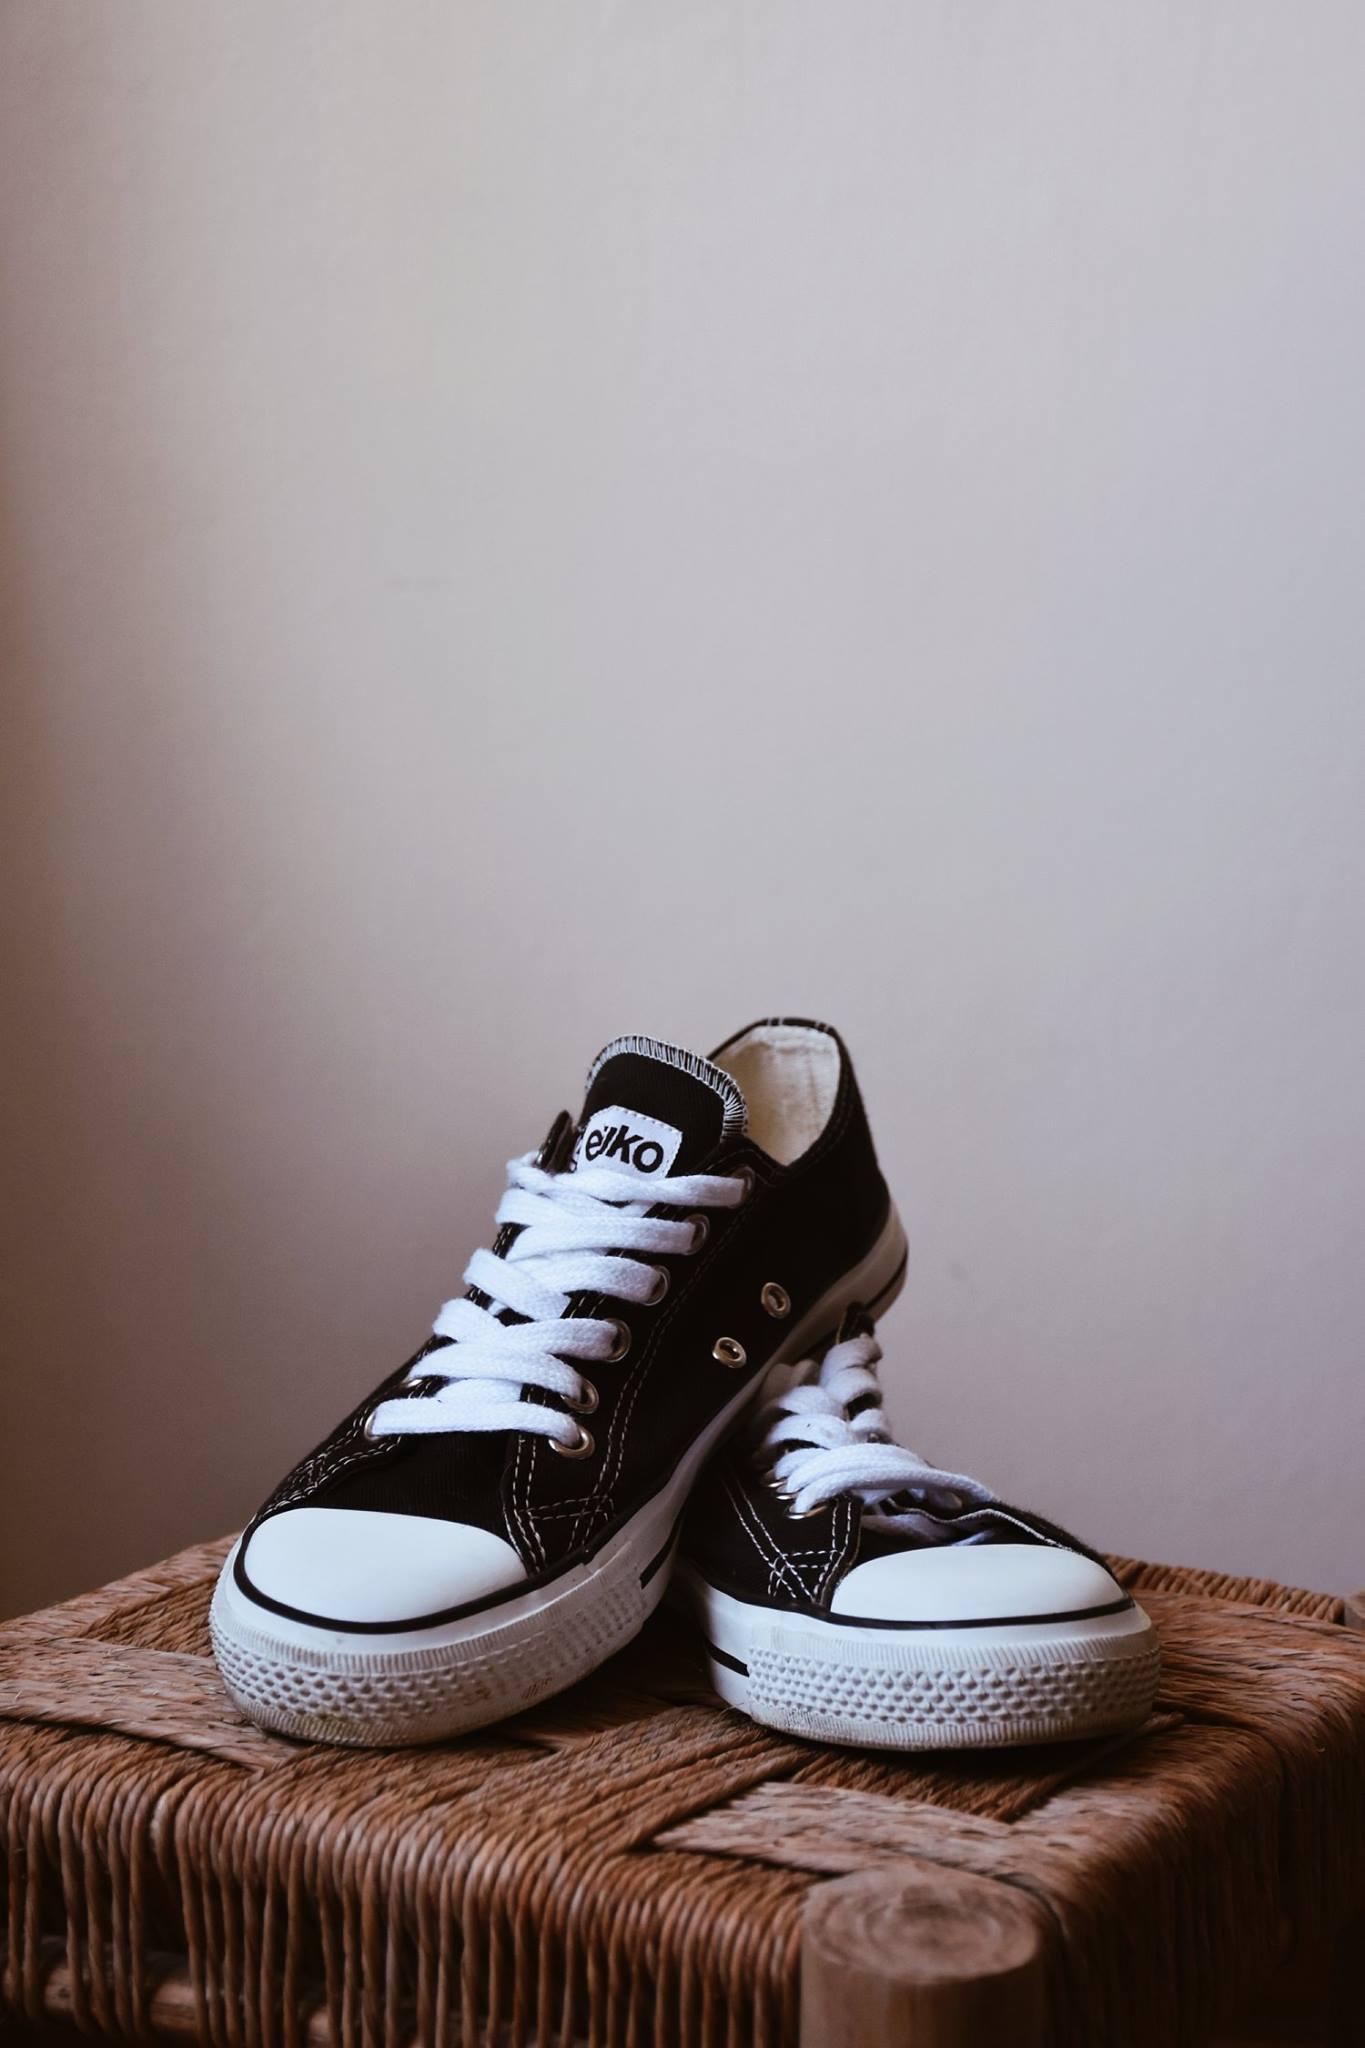 Etiko shoes